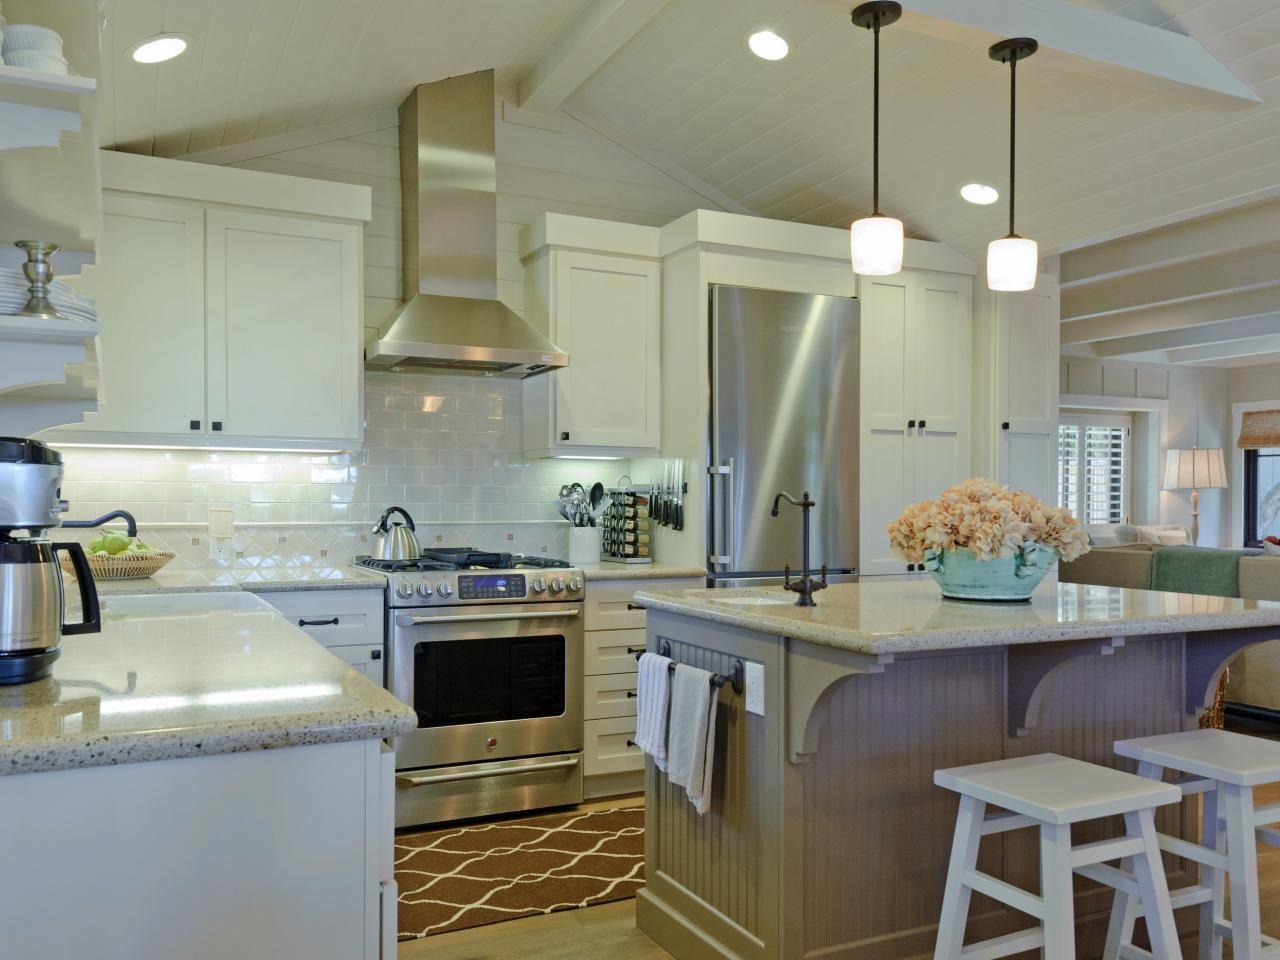 Kitchen Island Centerpiece Two Iron Pendant Lights Hang Above A Kitchen Island Centerpiece In